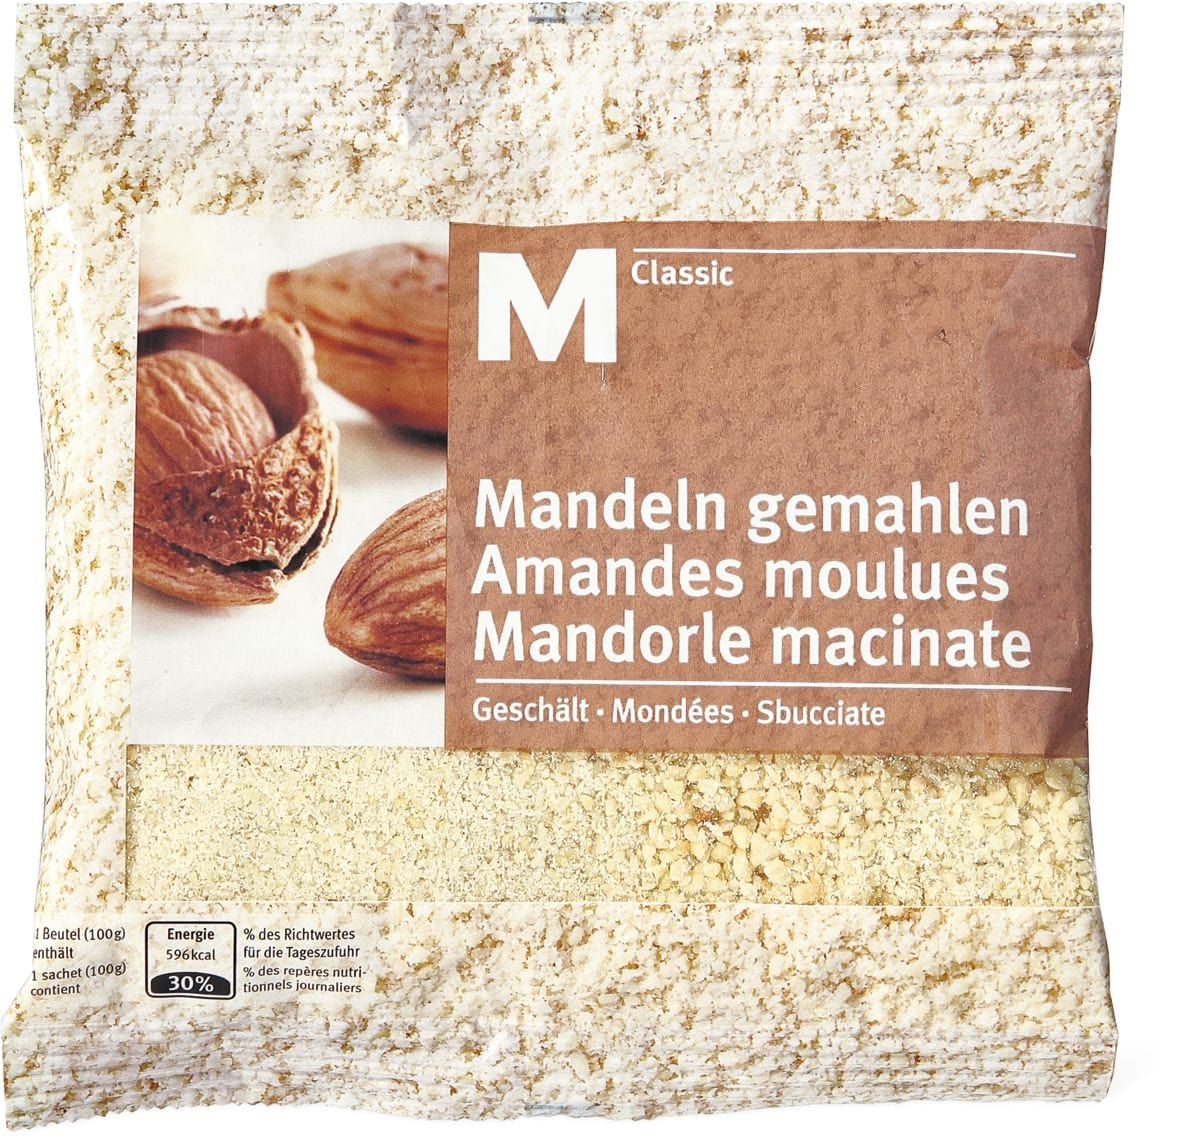 M-Classic Mandorle macinate+sbucciate